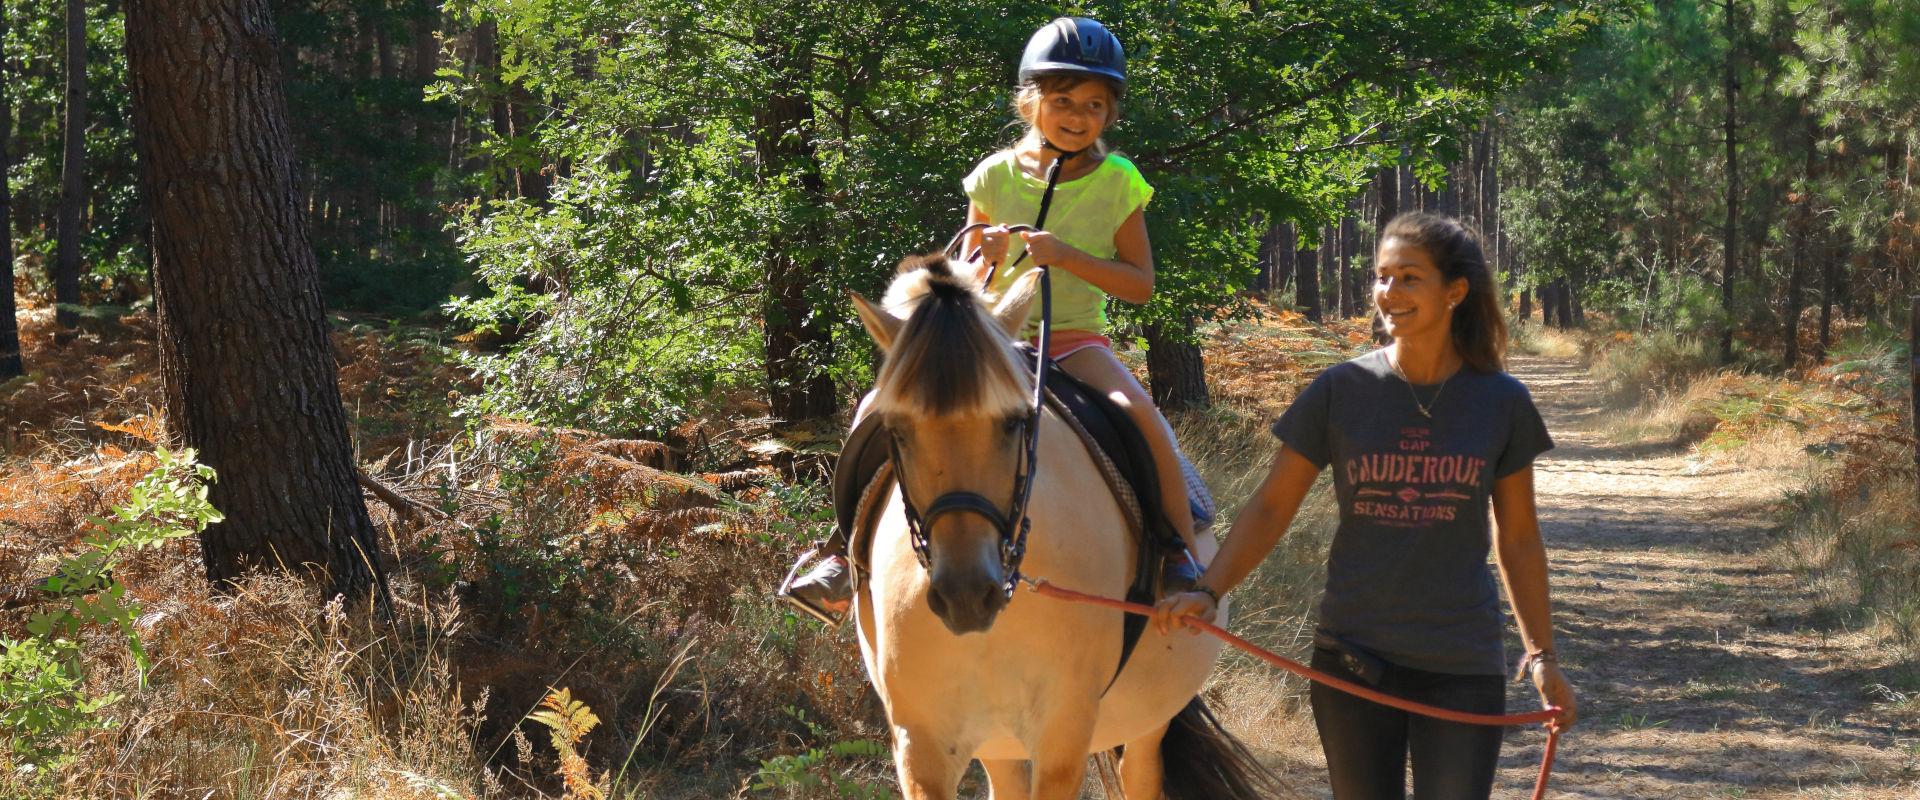 Balade à cheval en Albret